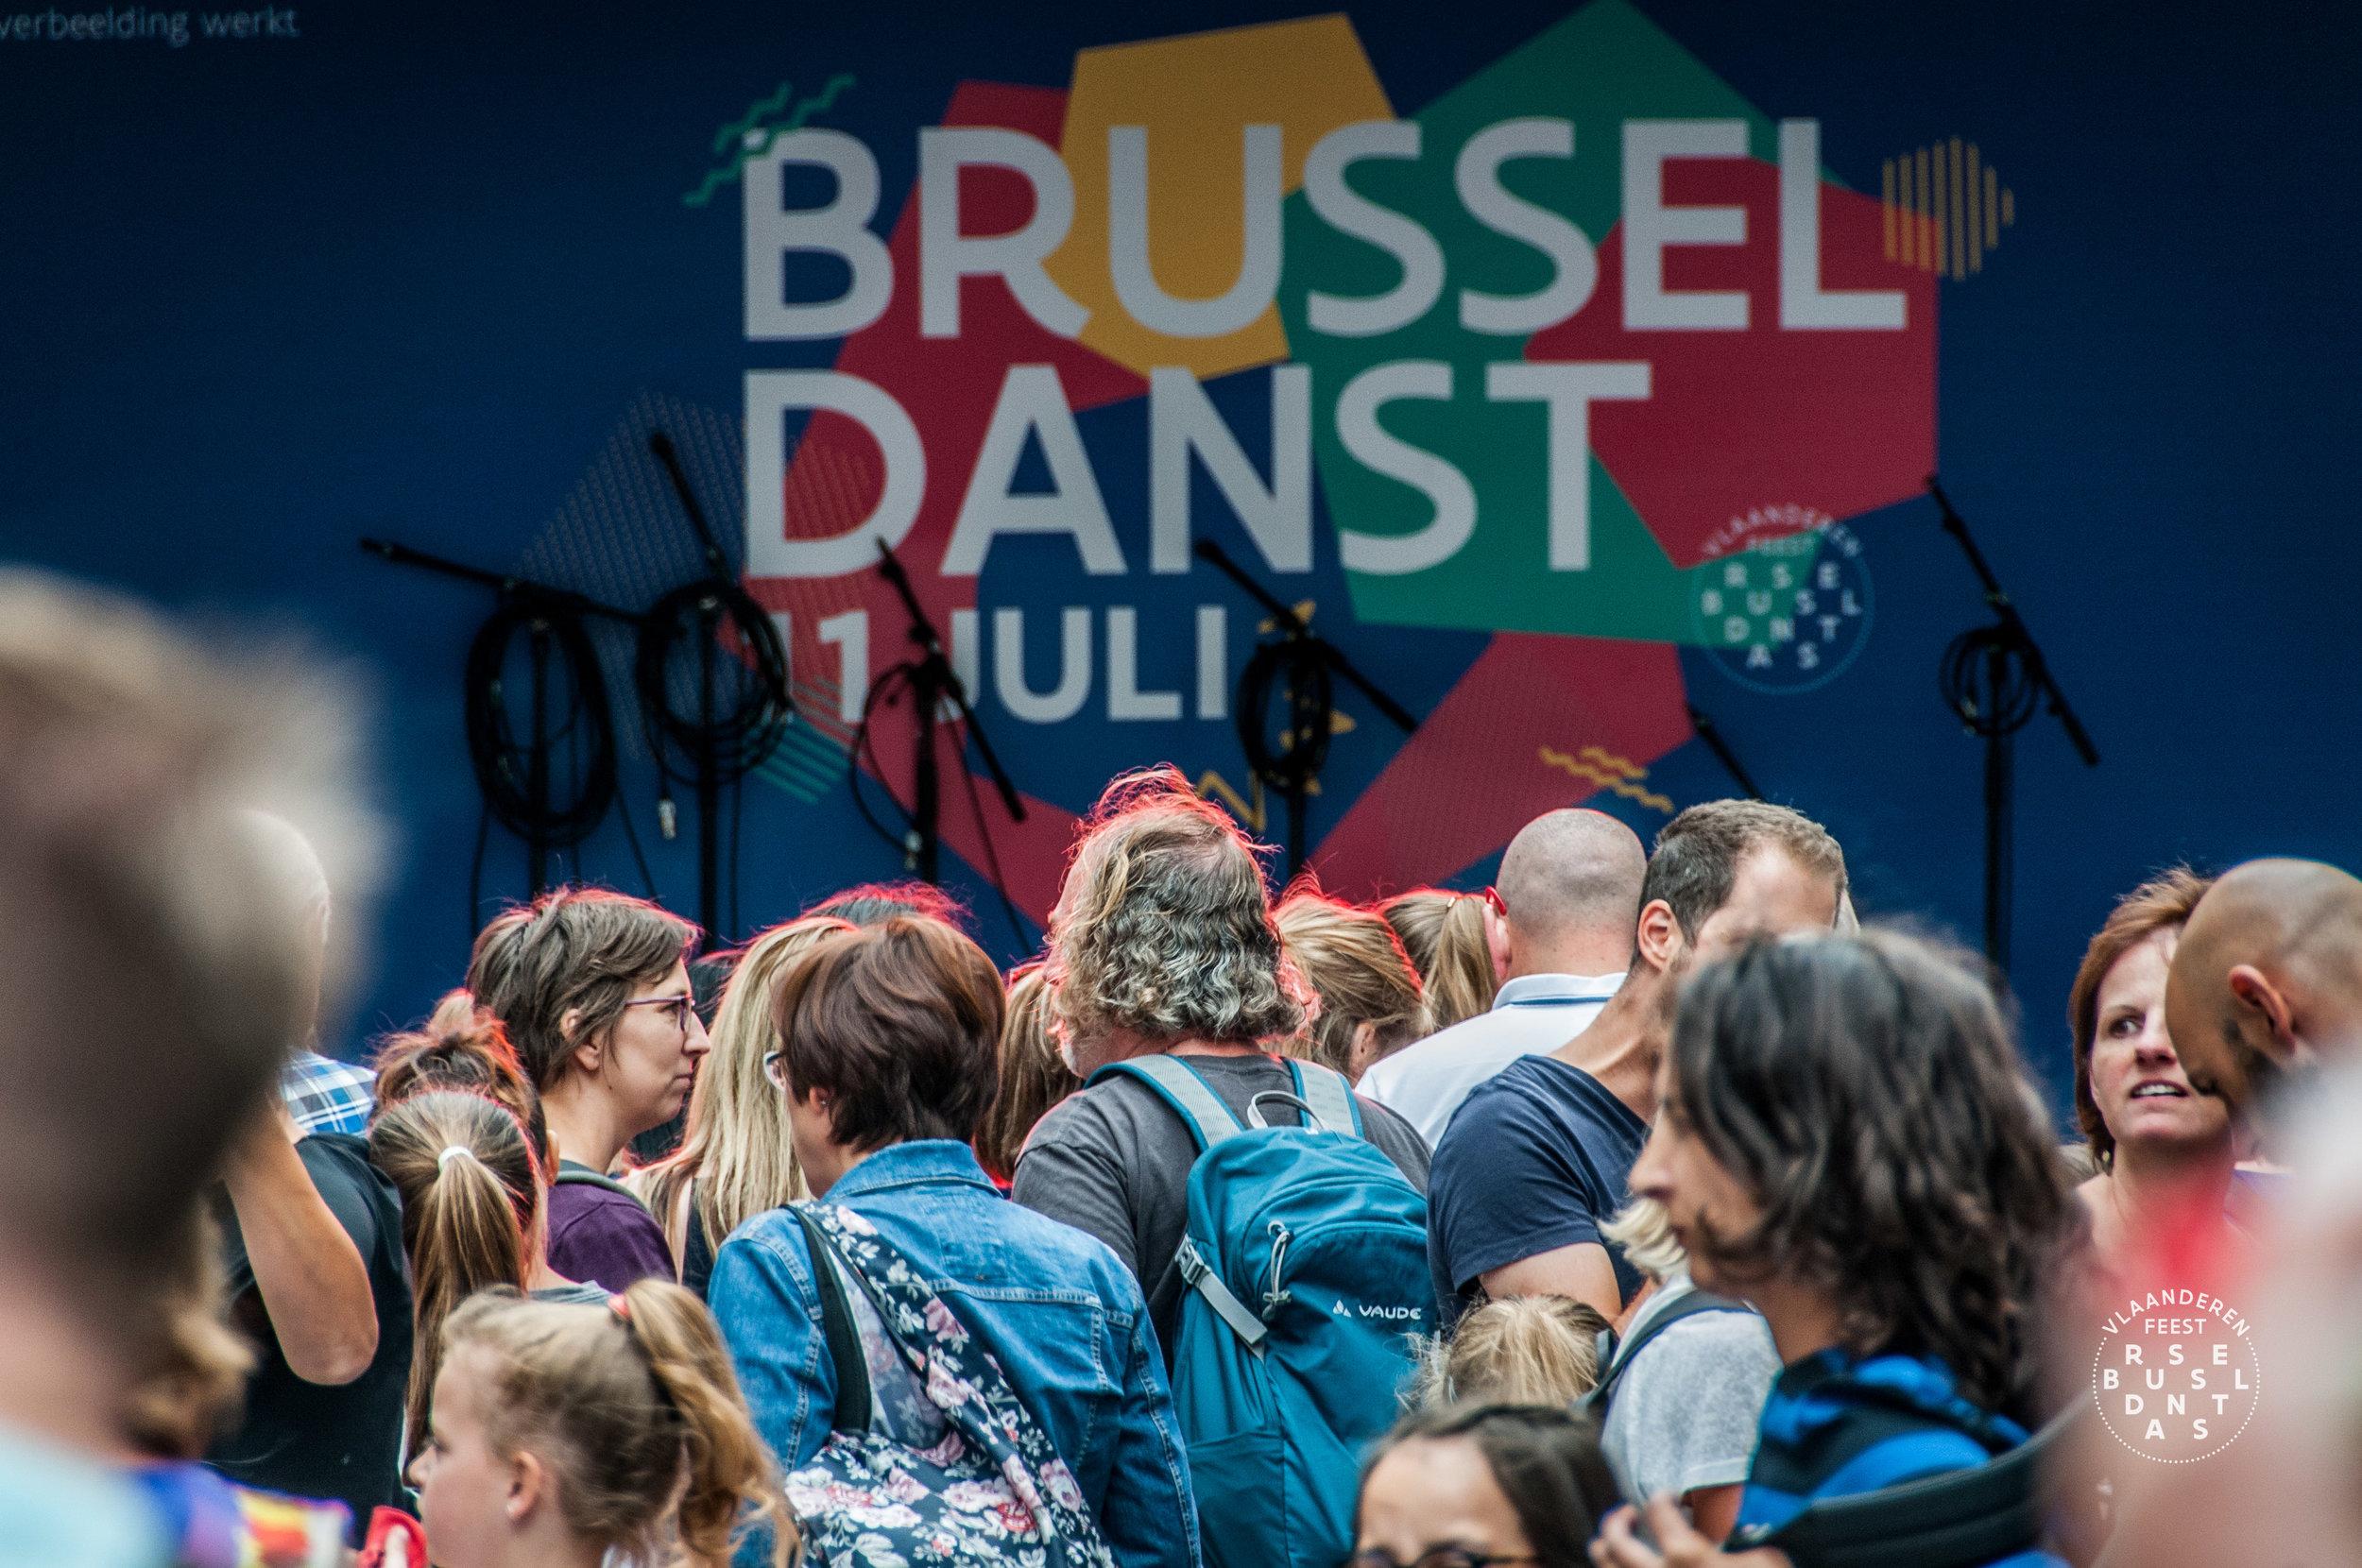 006_Brusseldanst_HIRES_logo.jpg